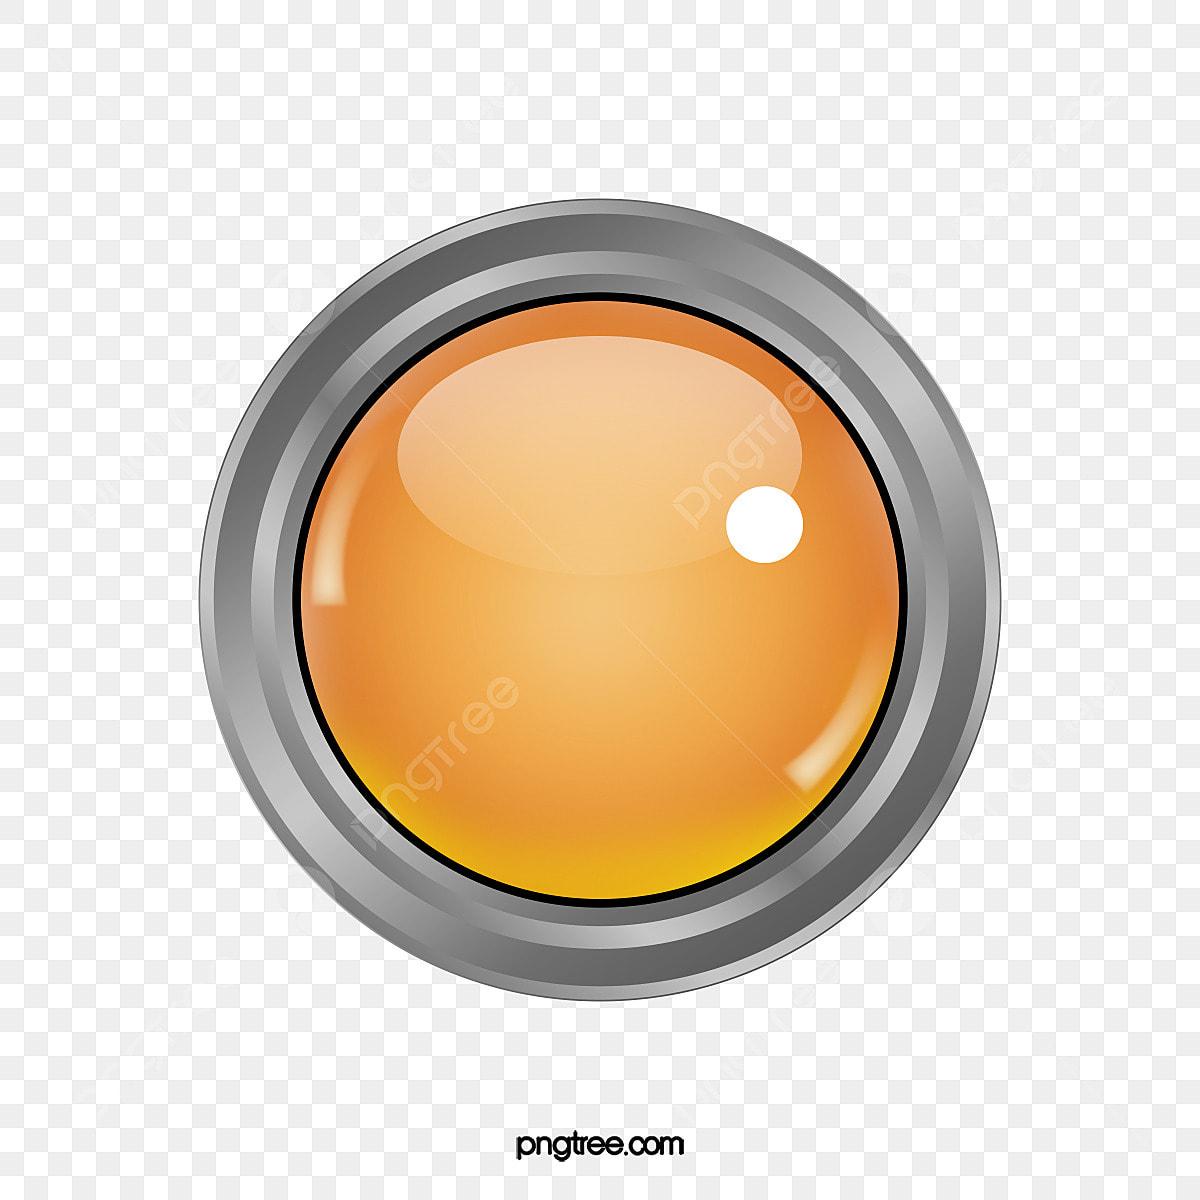 le bouton rond bouton de m u00e9tal en mati u00e8re de bouton